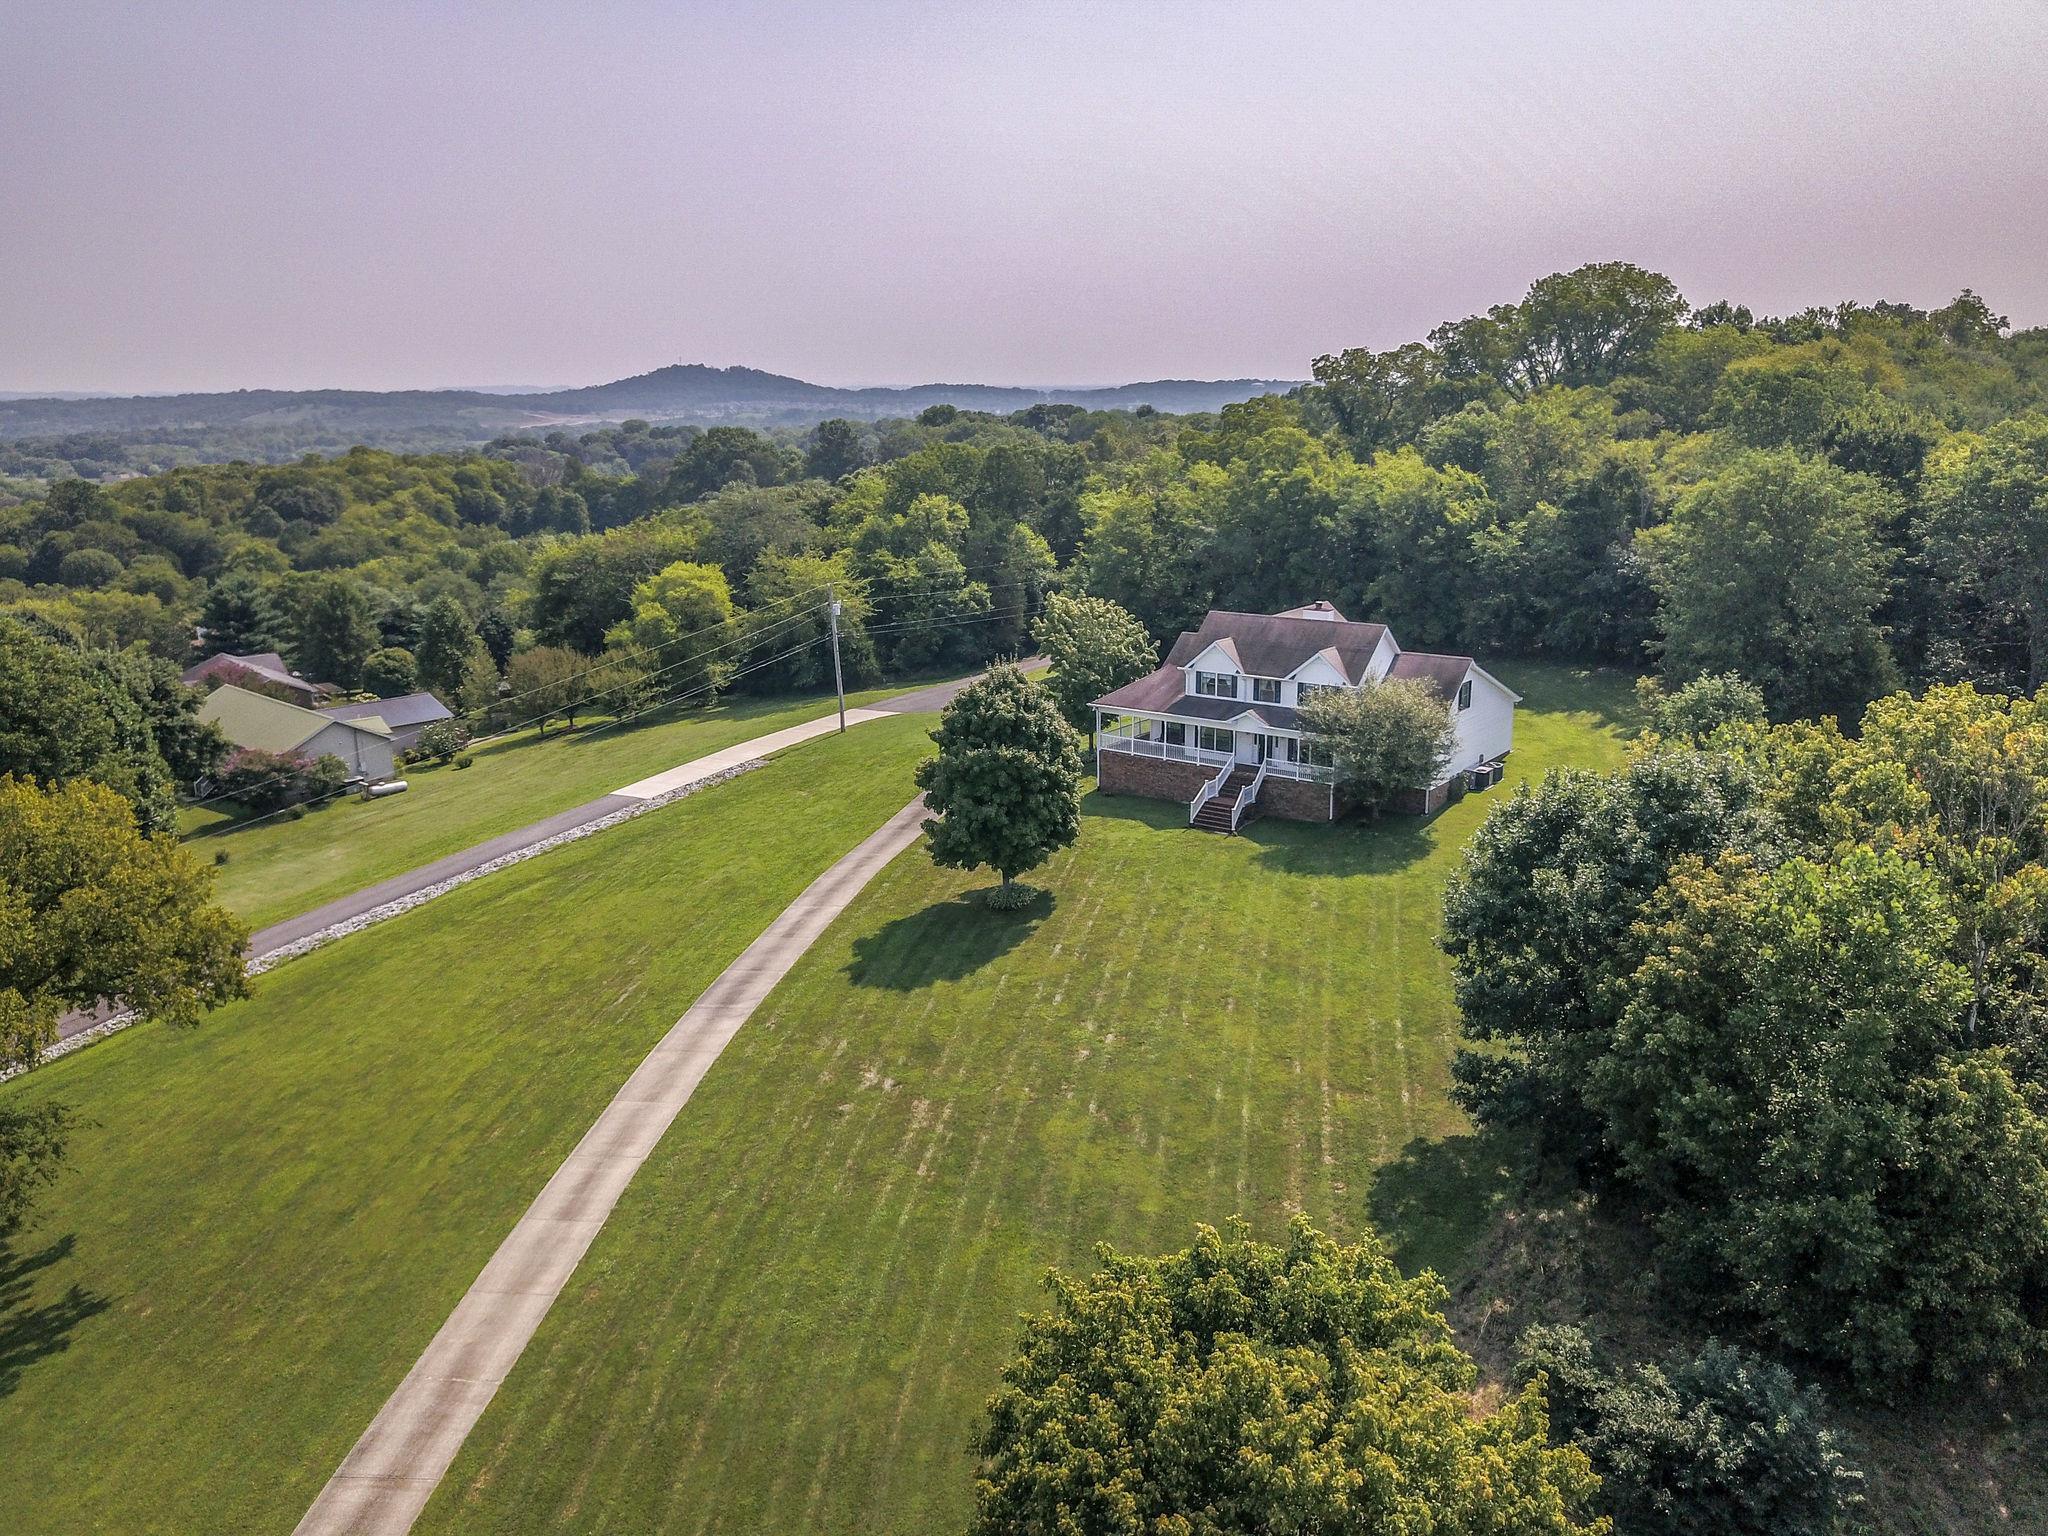 2589 Long Hollow Pike, Hendersonville, TN 37075 - Hendersonville, TN real estate listing